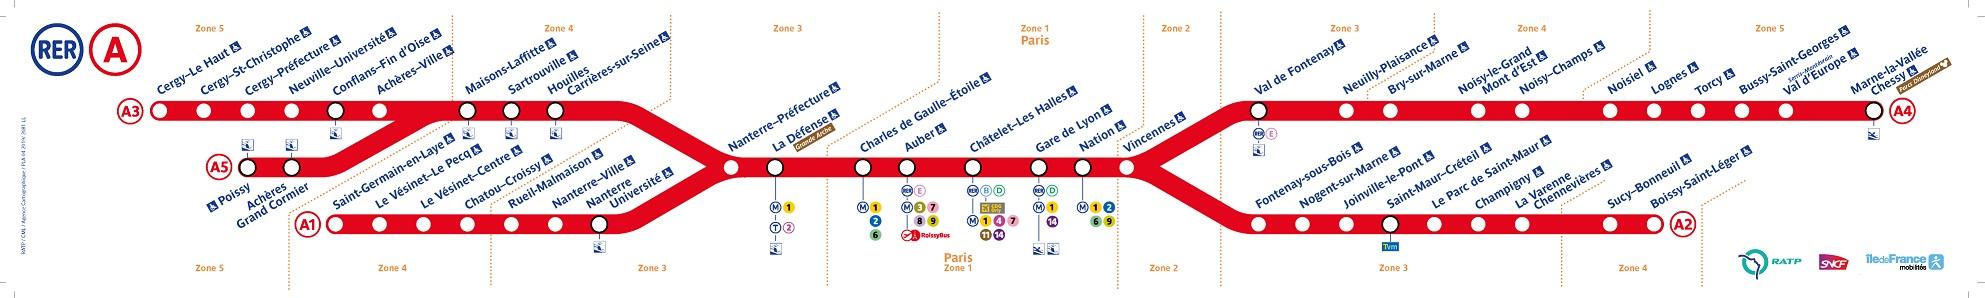 RER A map - train to Disneyland Paris - image courtesy of https://www.ratp.fr